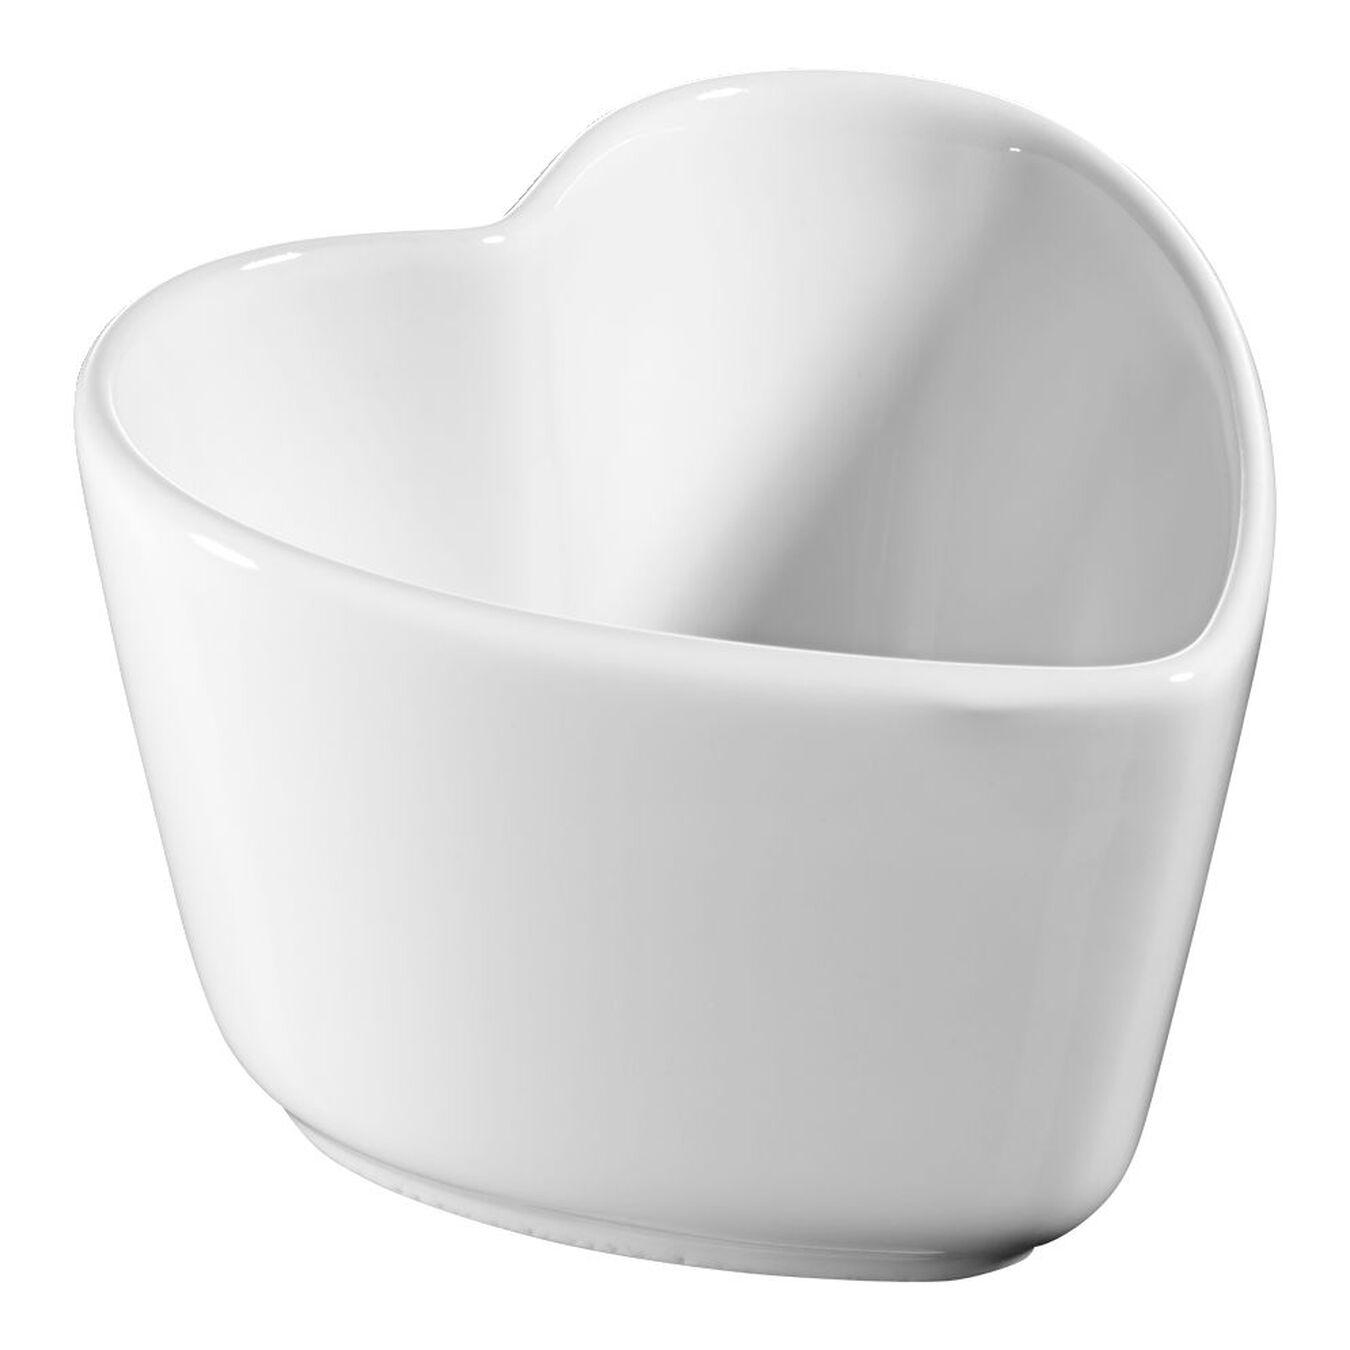 Sufle Kabı Seti, 2-parça | Beyaz | Seramik | Kalp | Seramik,,large 1